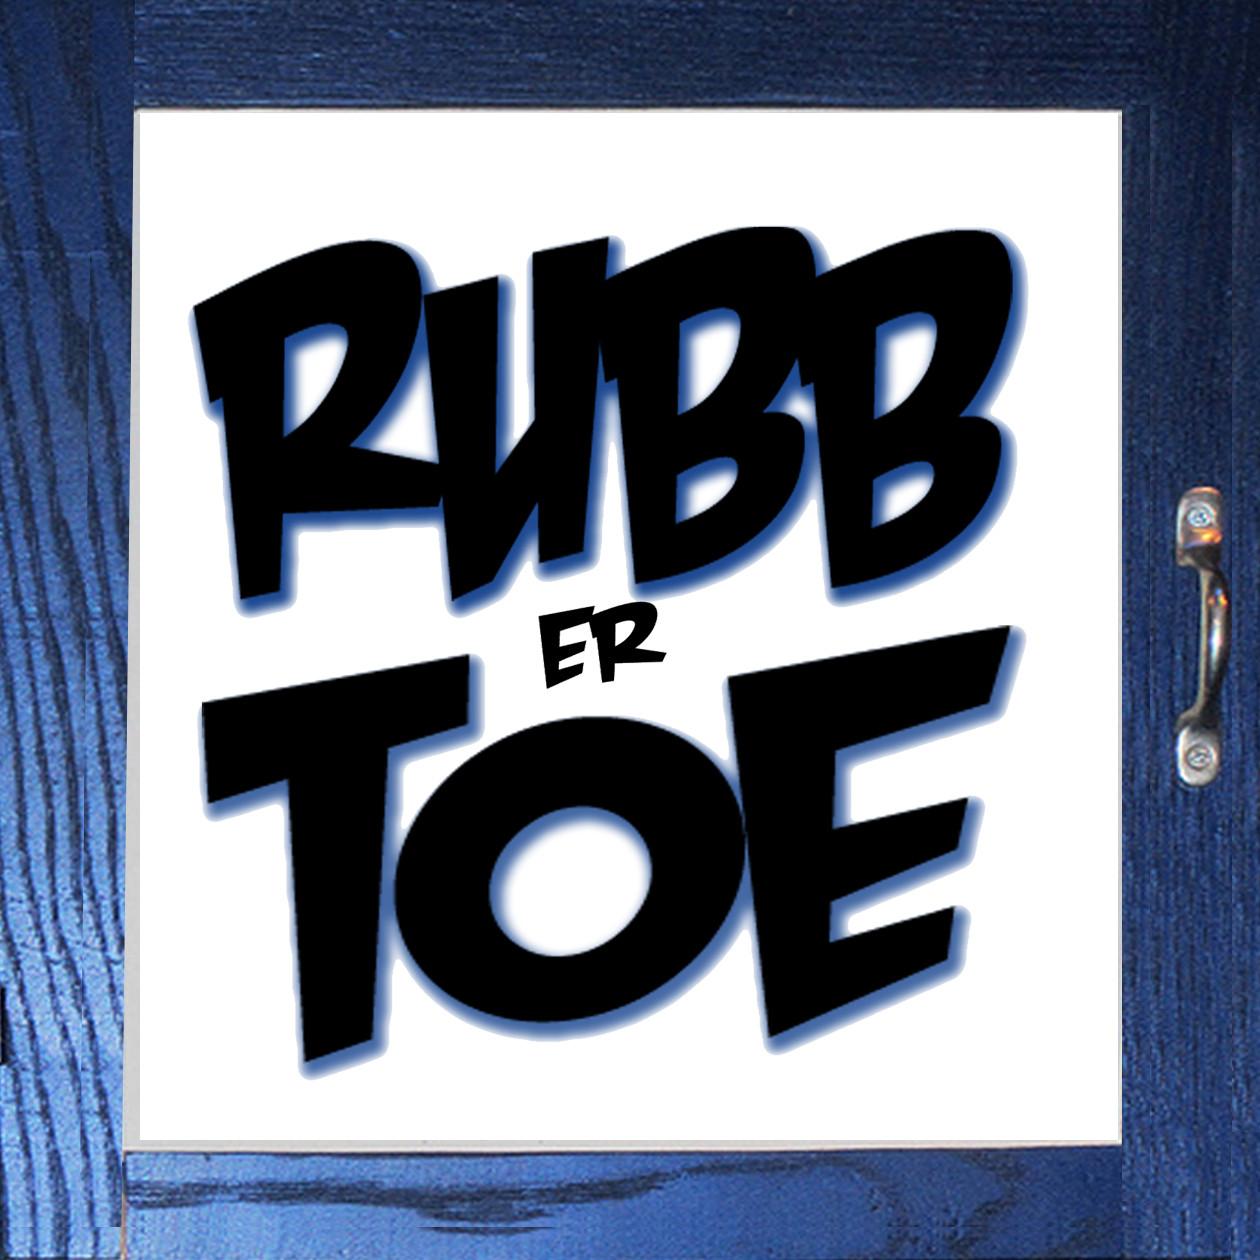 www.rubbertoereplicas.com